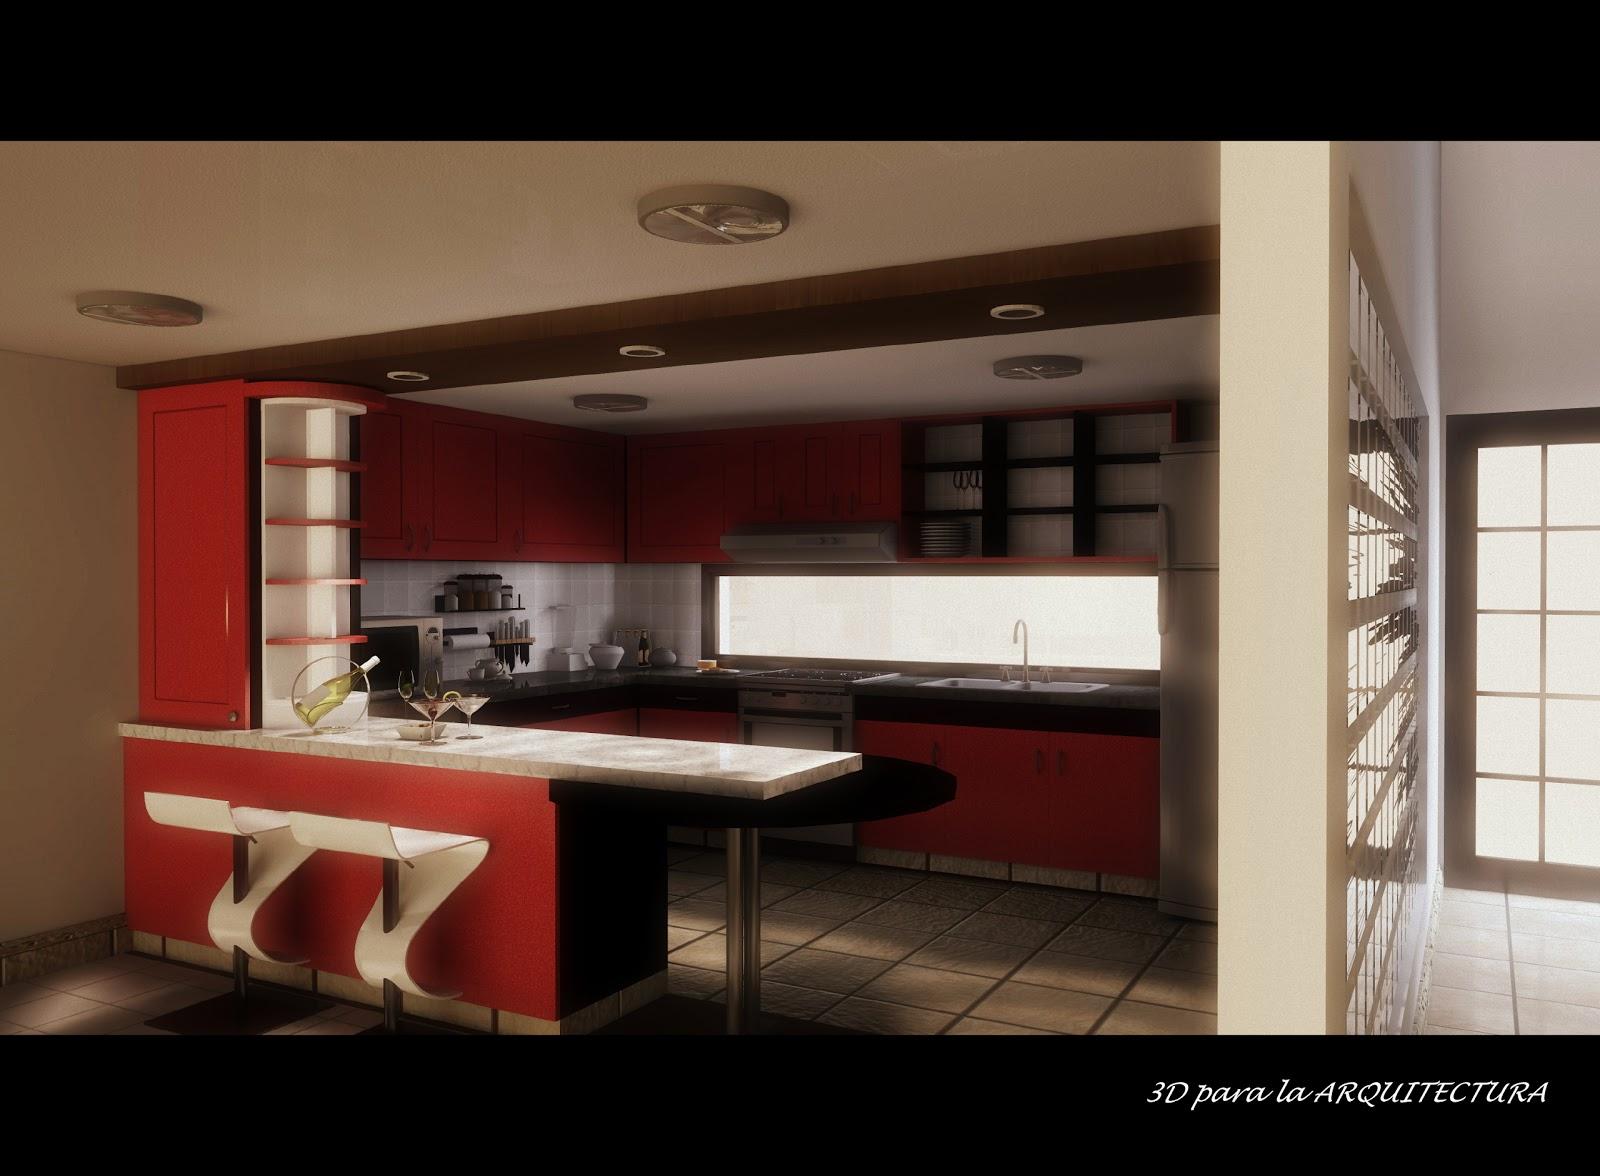 Cocina comedor de dise o contempor neo 3d render para la - Diseno de cocina 3d ...